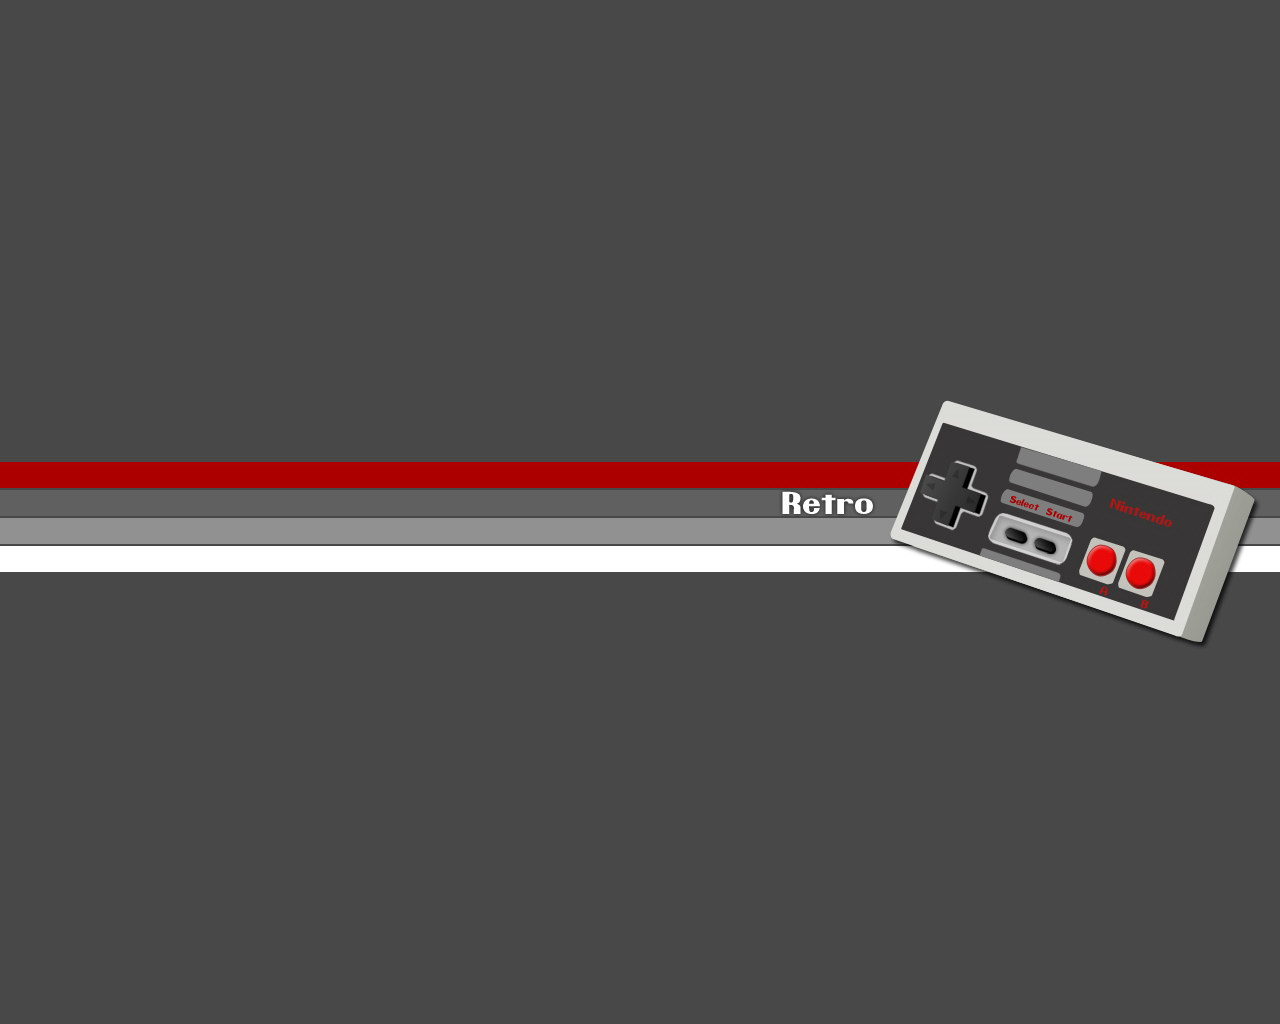 20 retro video gaming desktop wallpapers 1280x1024